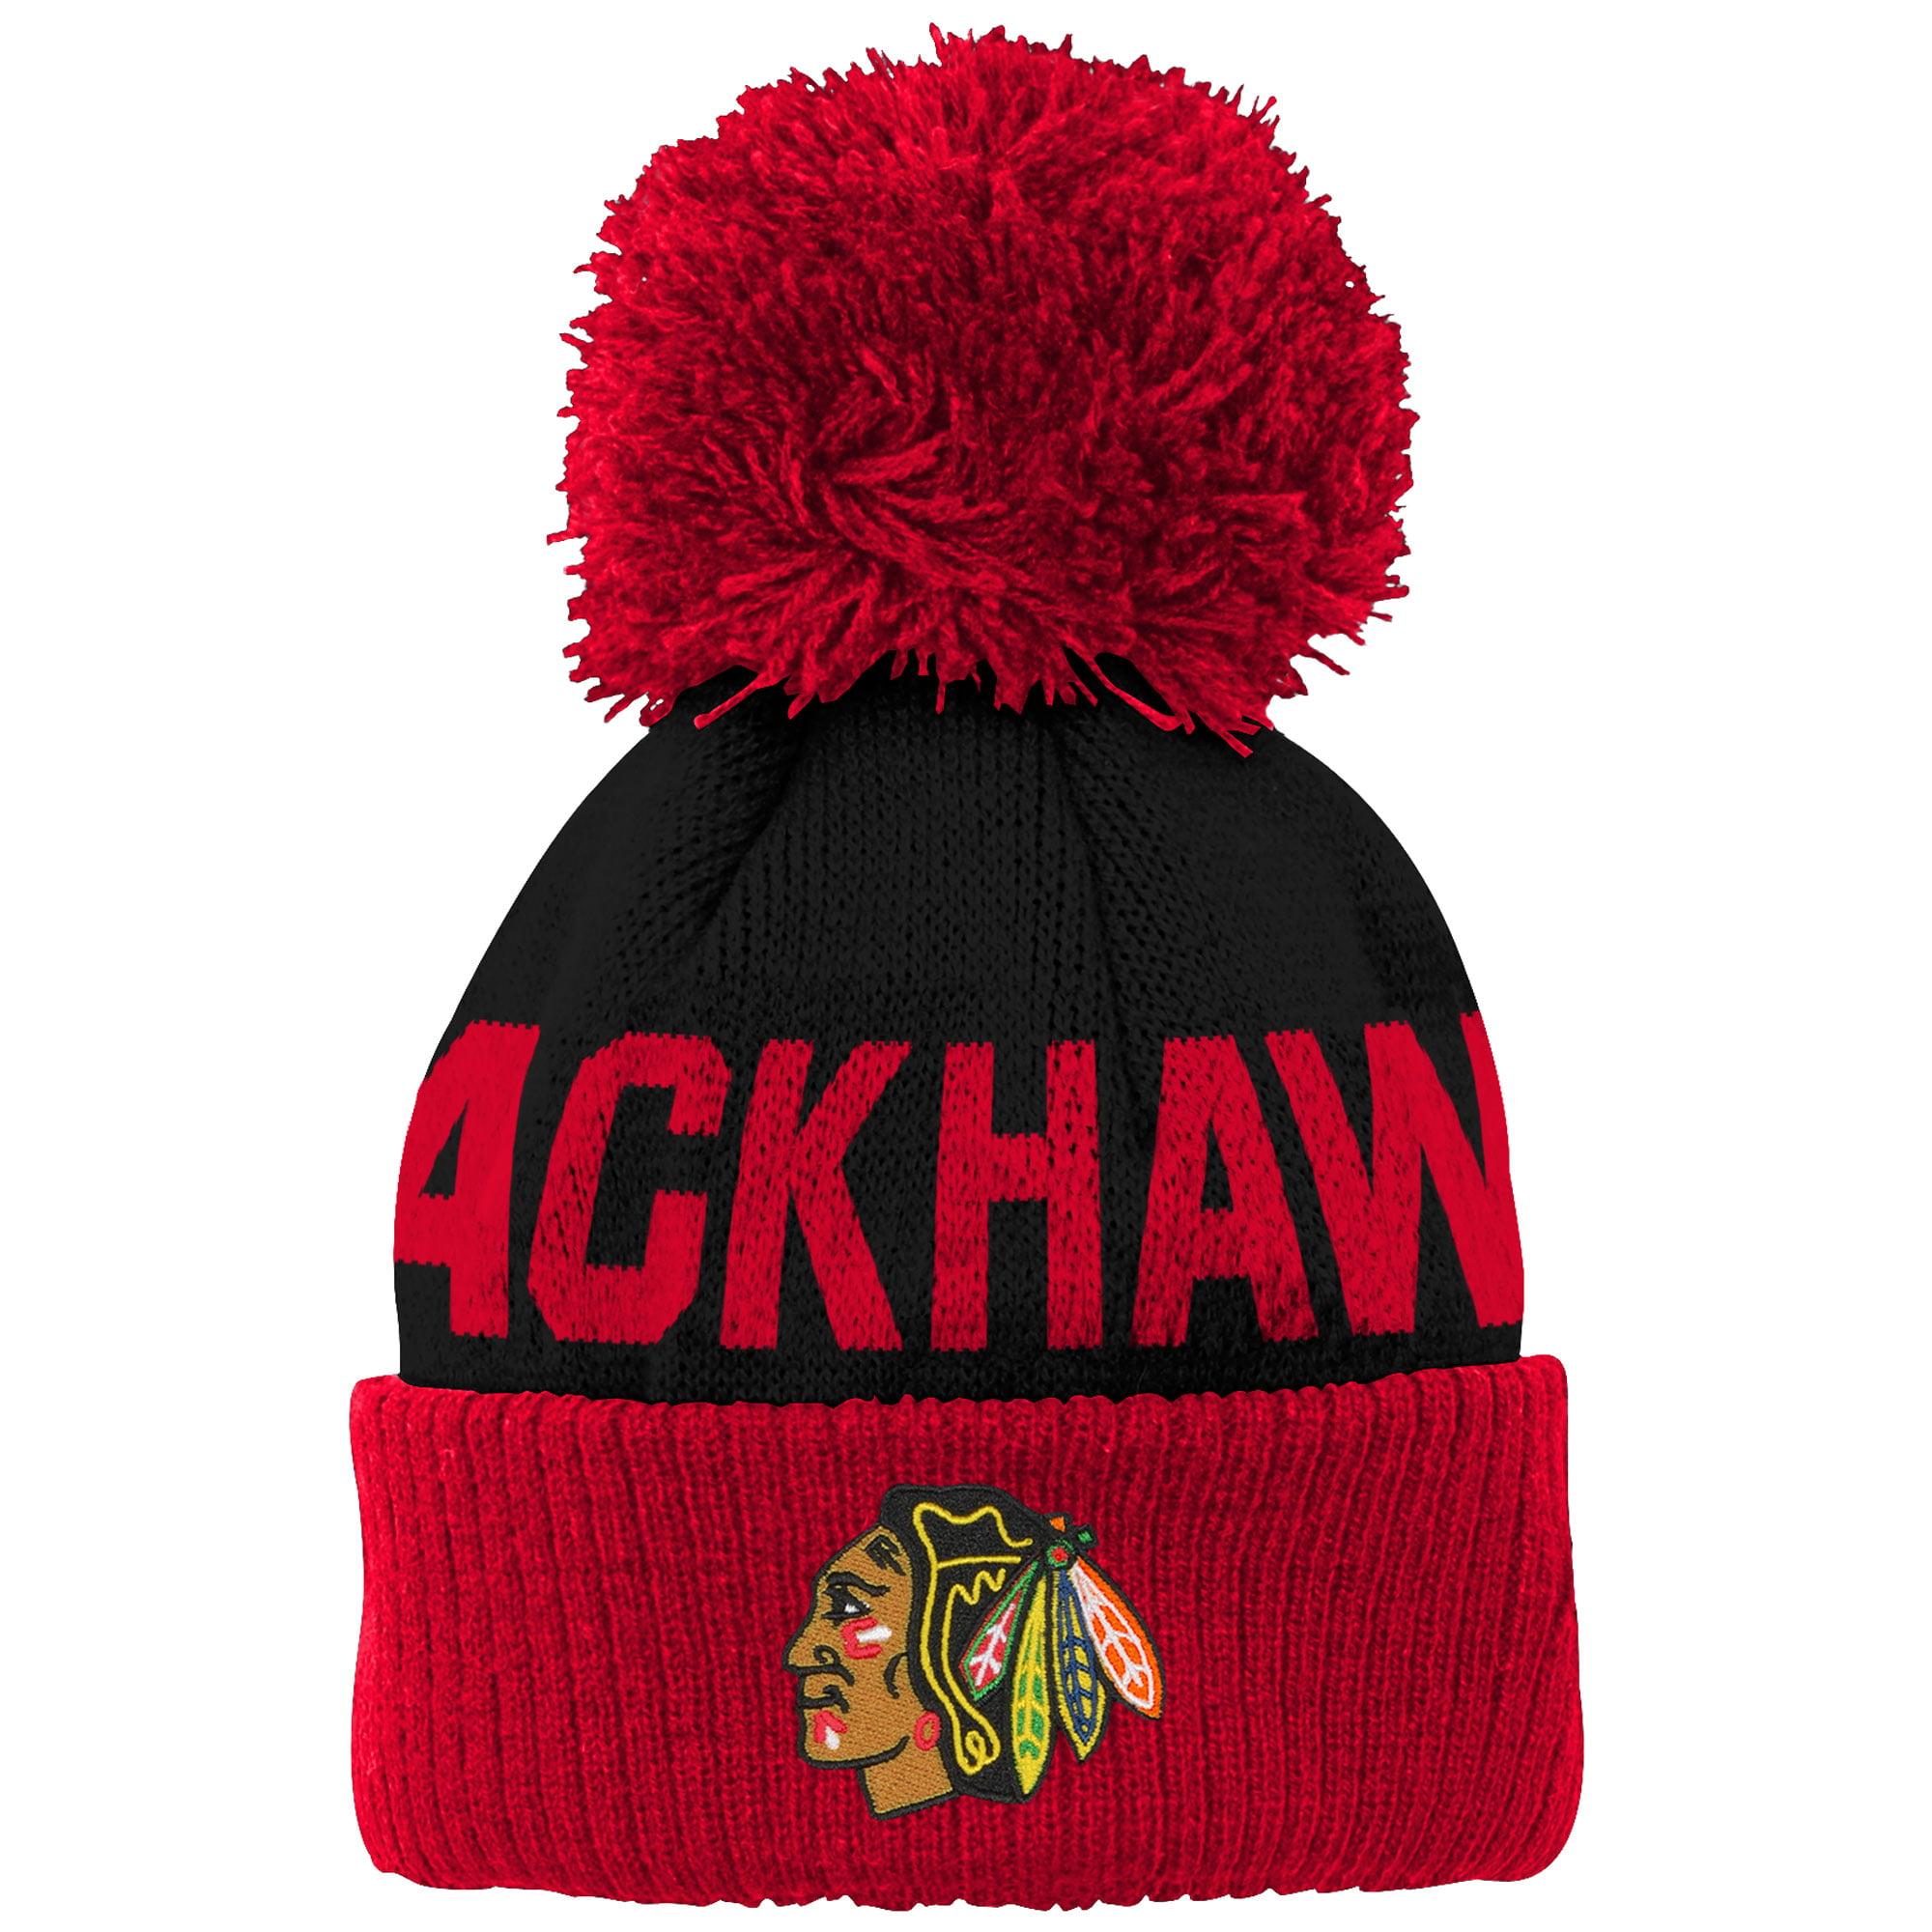 Chicago Blackhawks Newborn & Infant Block Wordmark Cuffed Pom Knit Hat - Black - OSFA